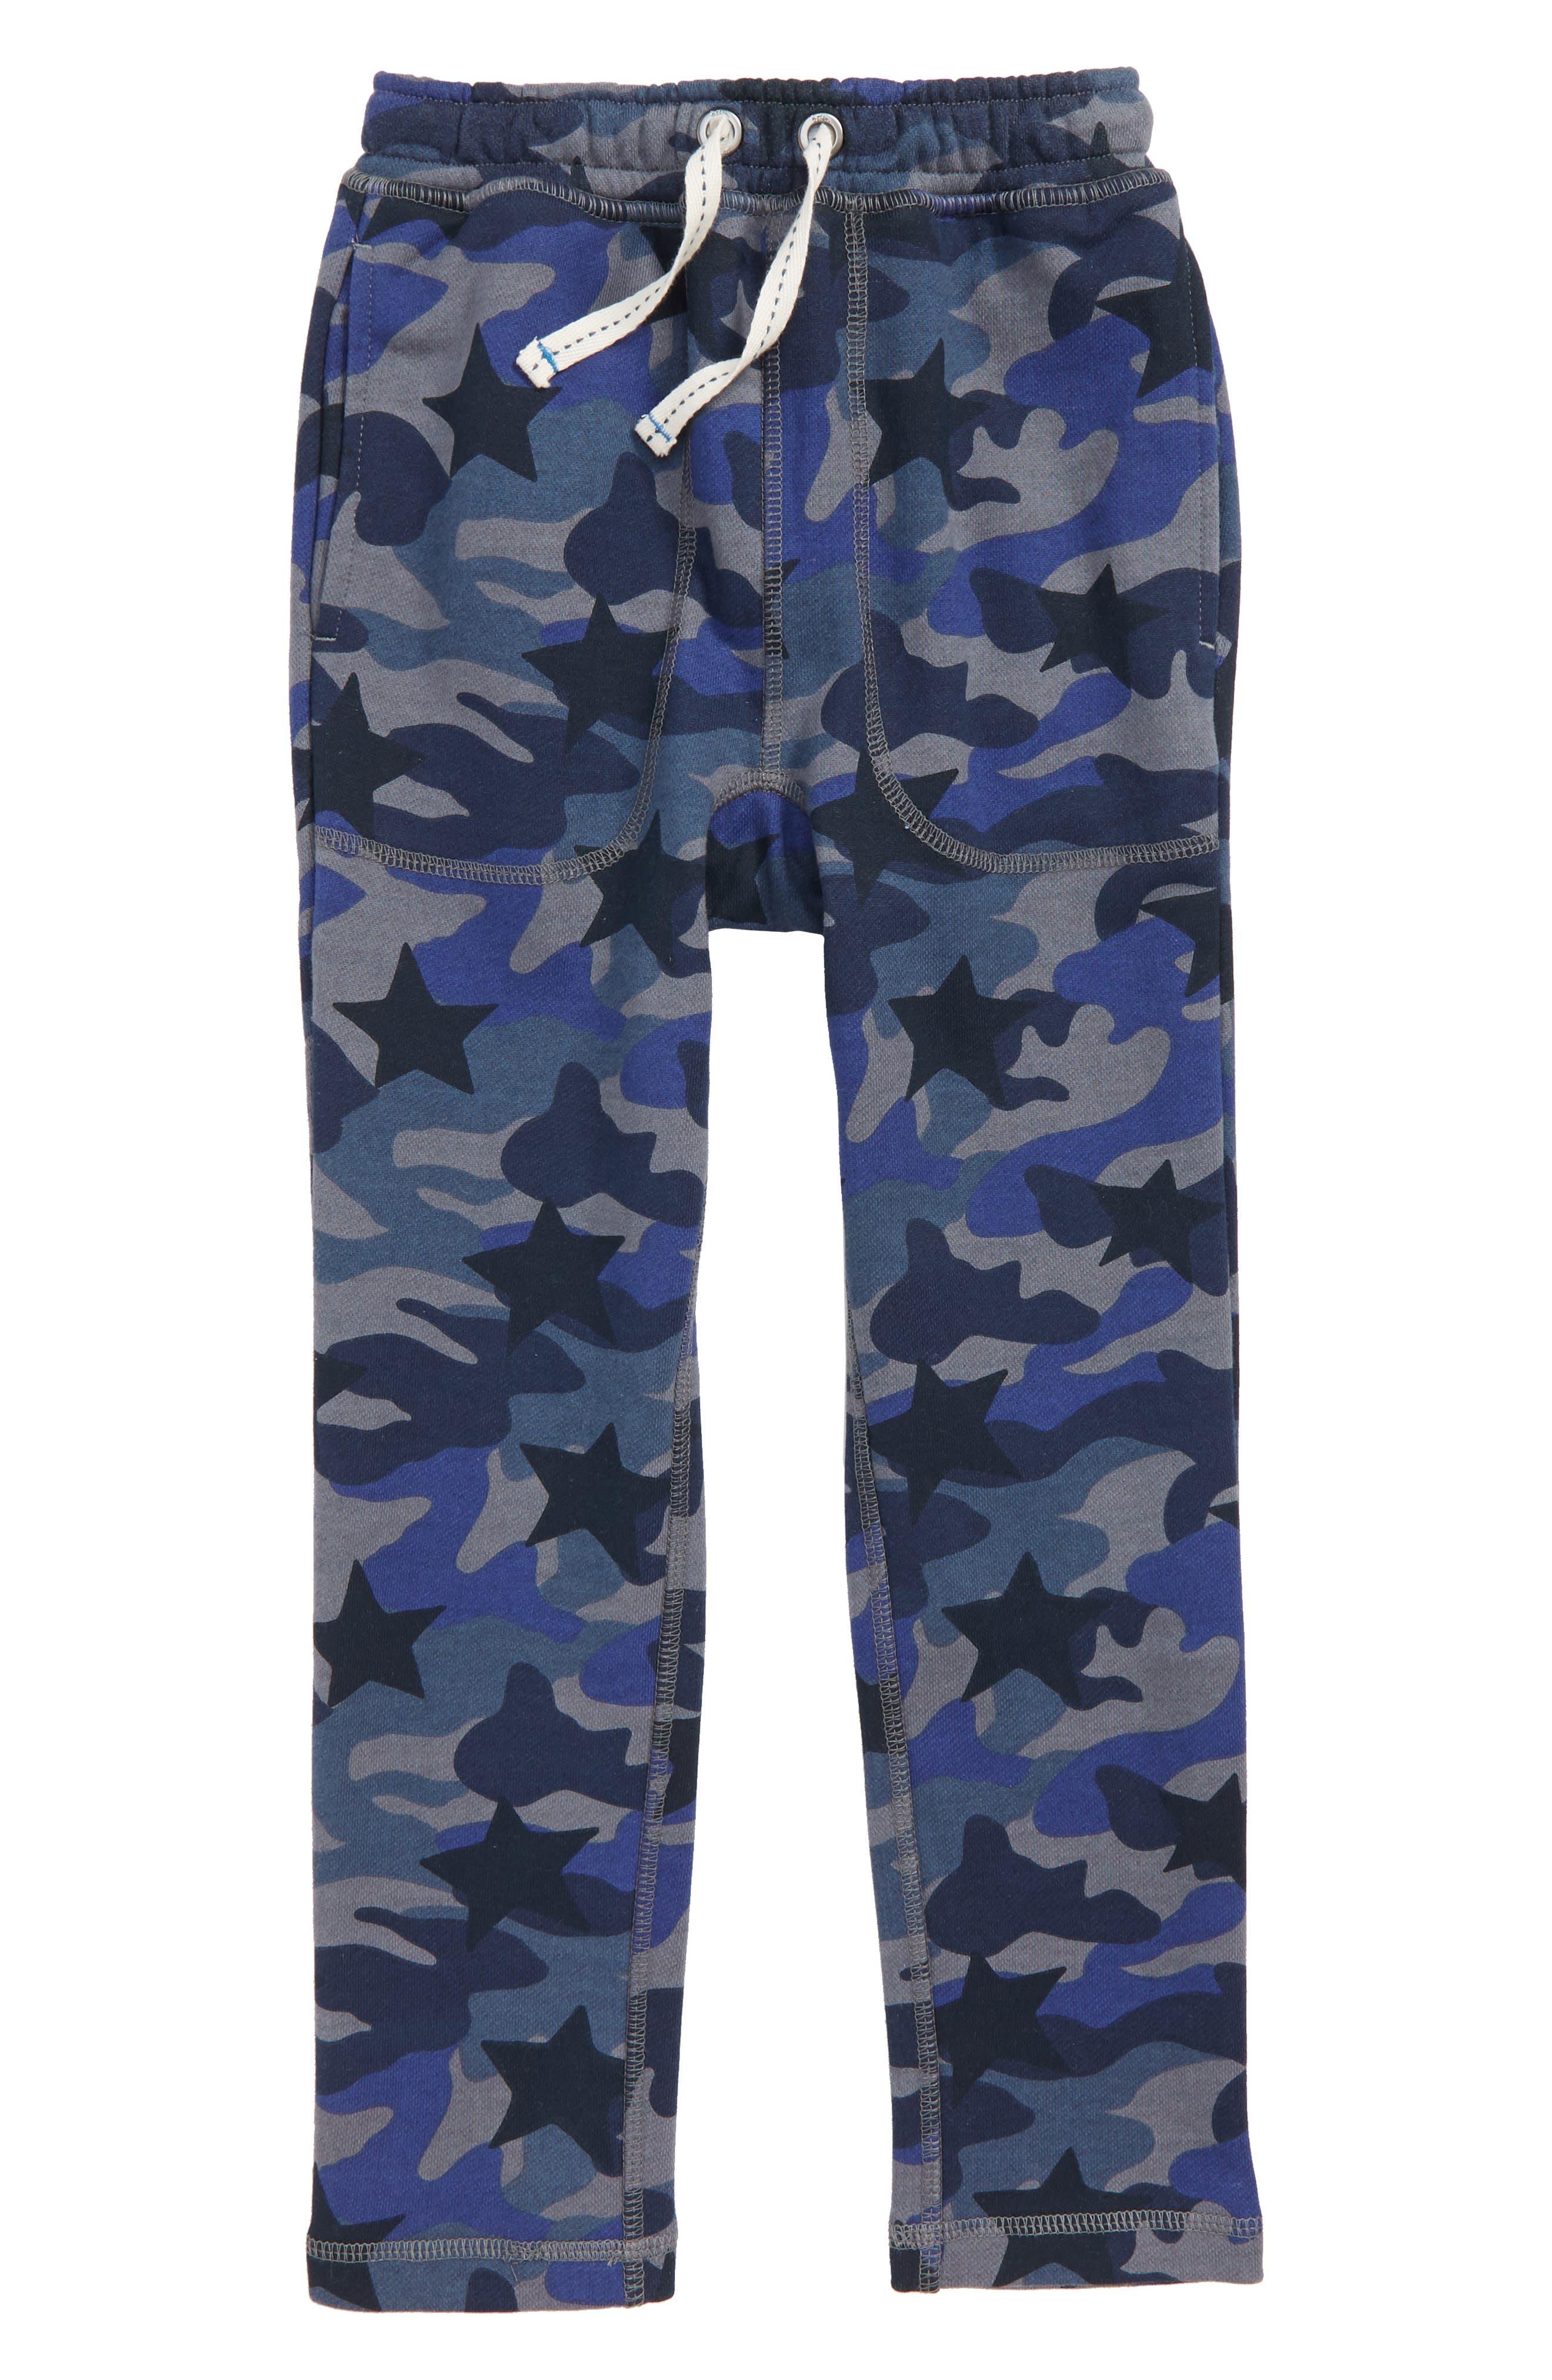 Slouch Sweatpants,                             Main thumbnail 1, color,                             RAFT GREY CAMO STAR